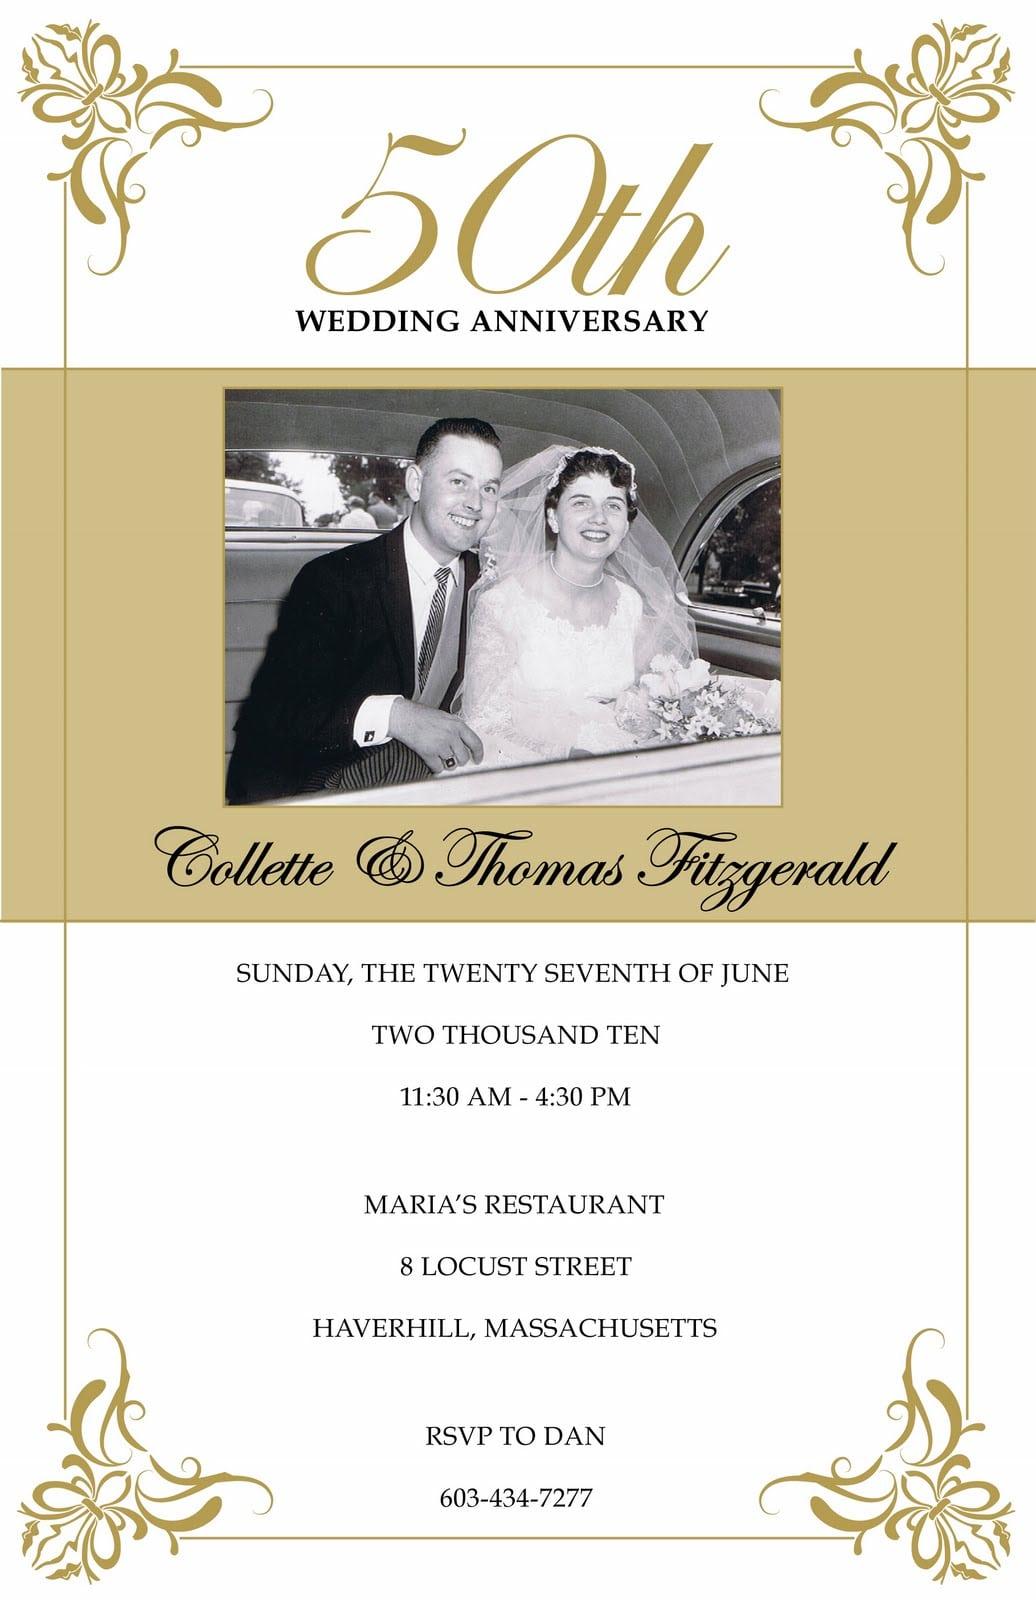 Sample invitation for wedding stopboris Choice Image